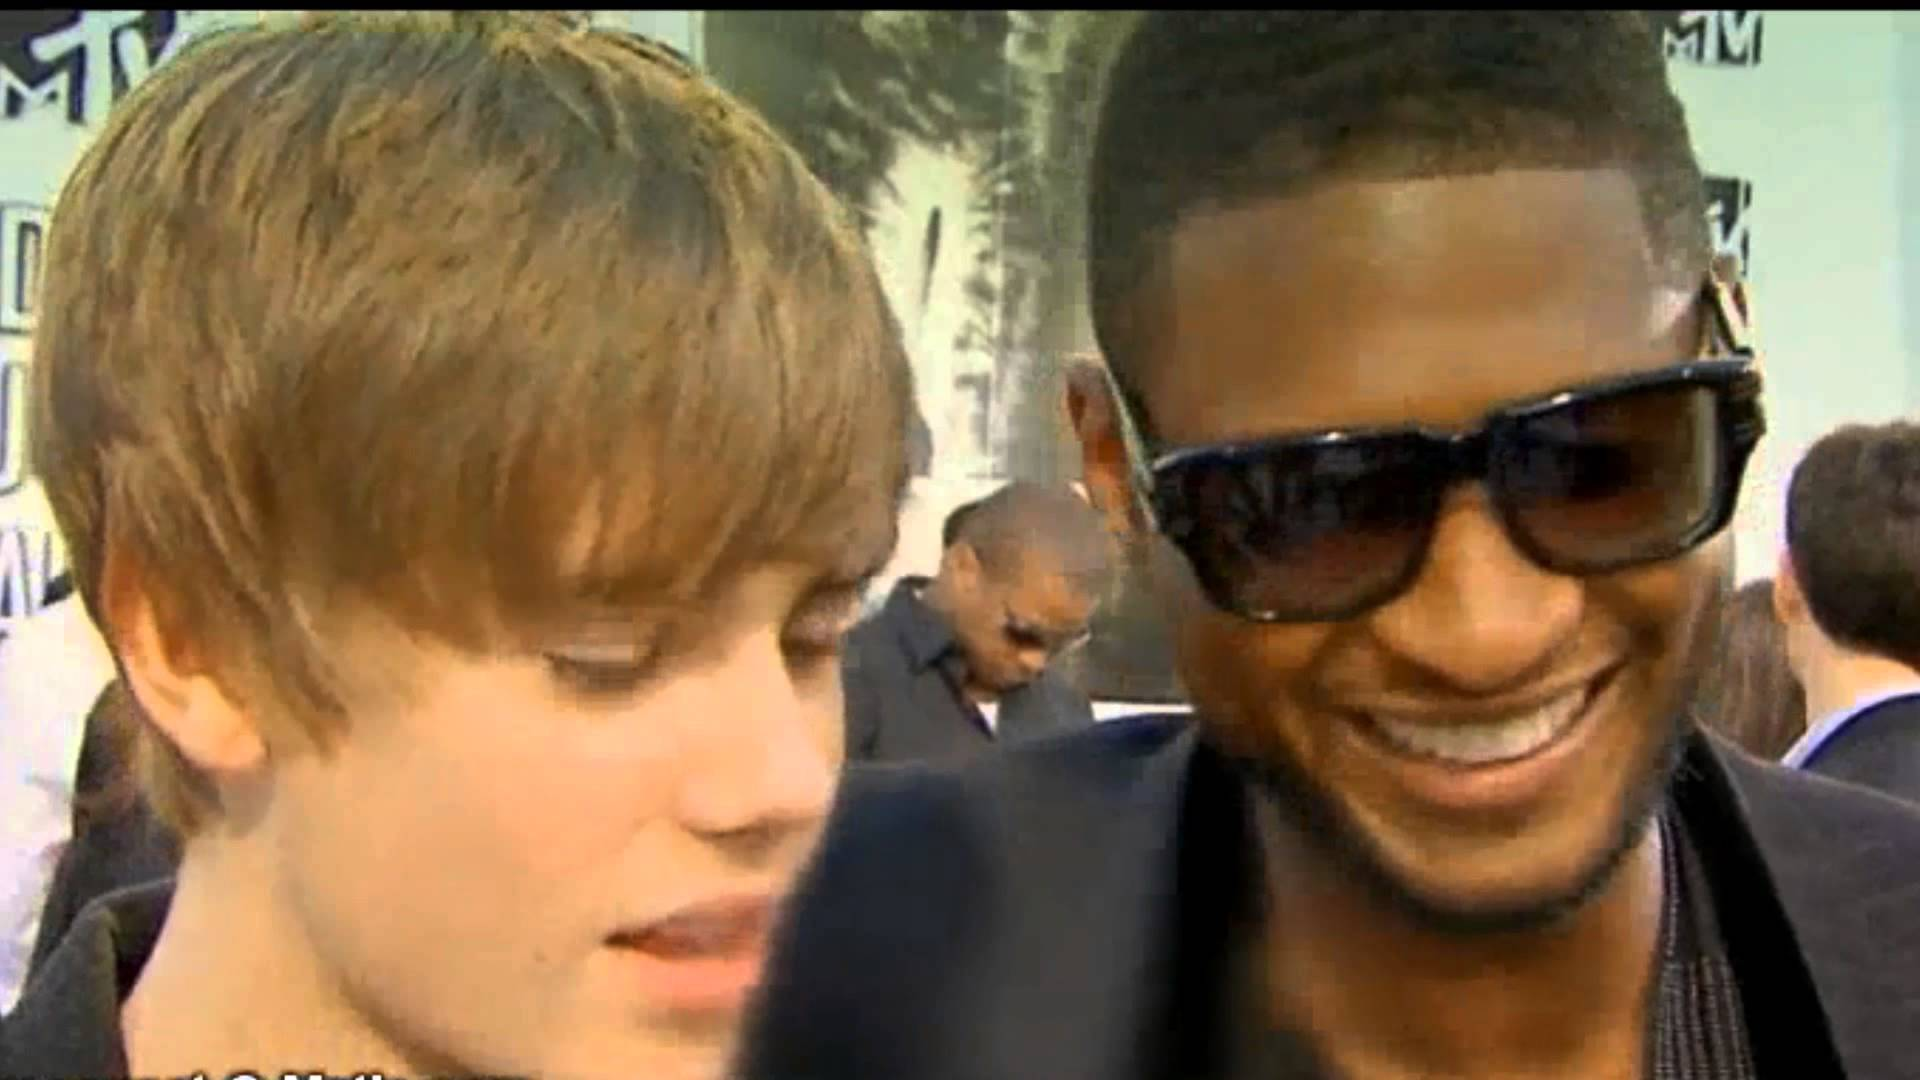 Justin Bieber: Always Believing (Trailer) 2013